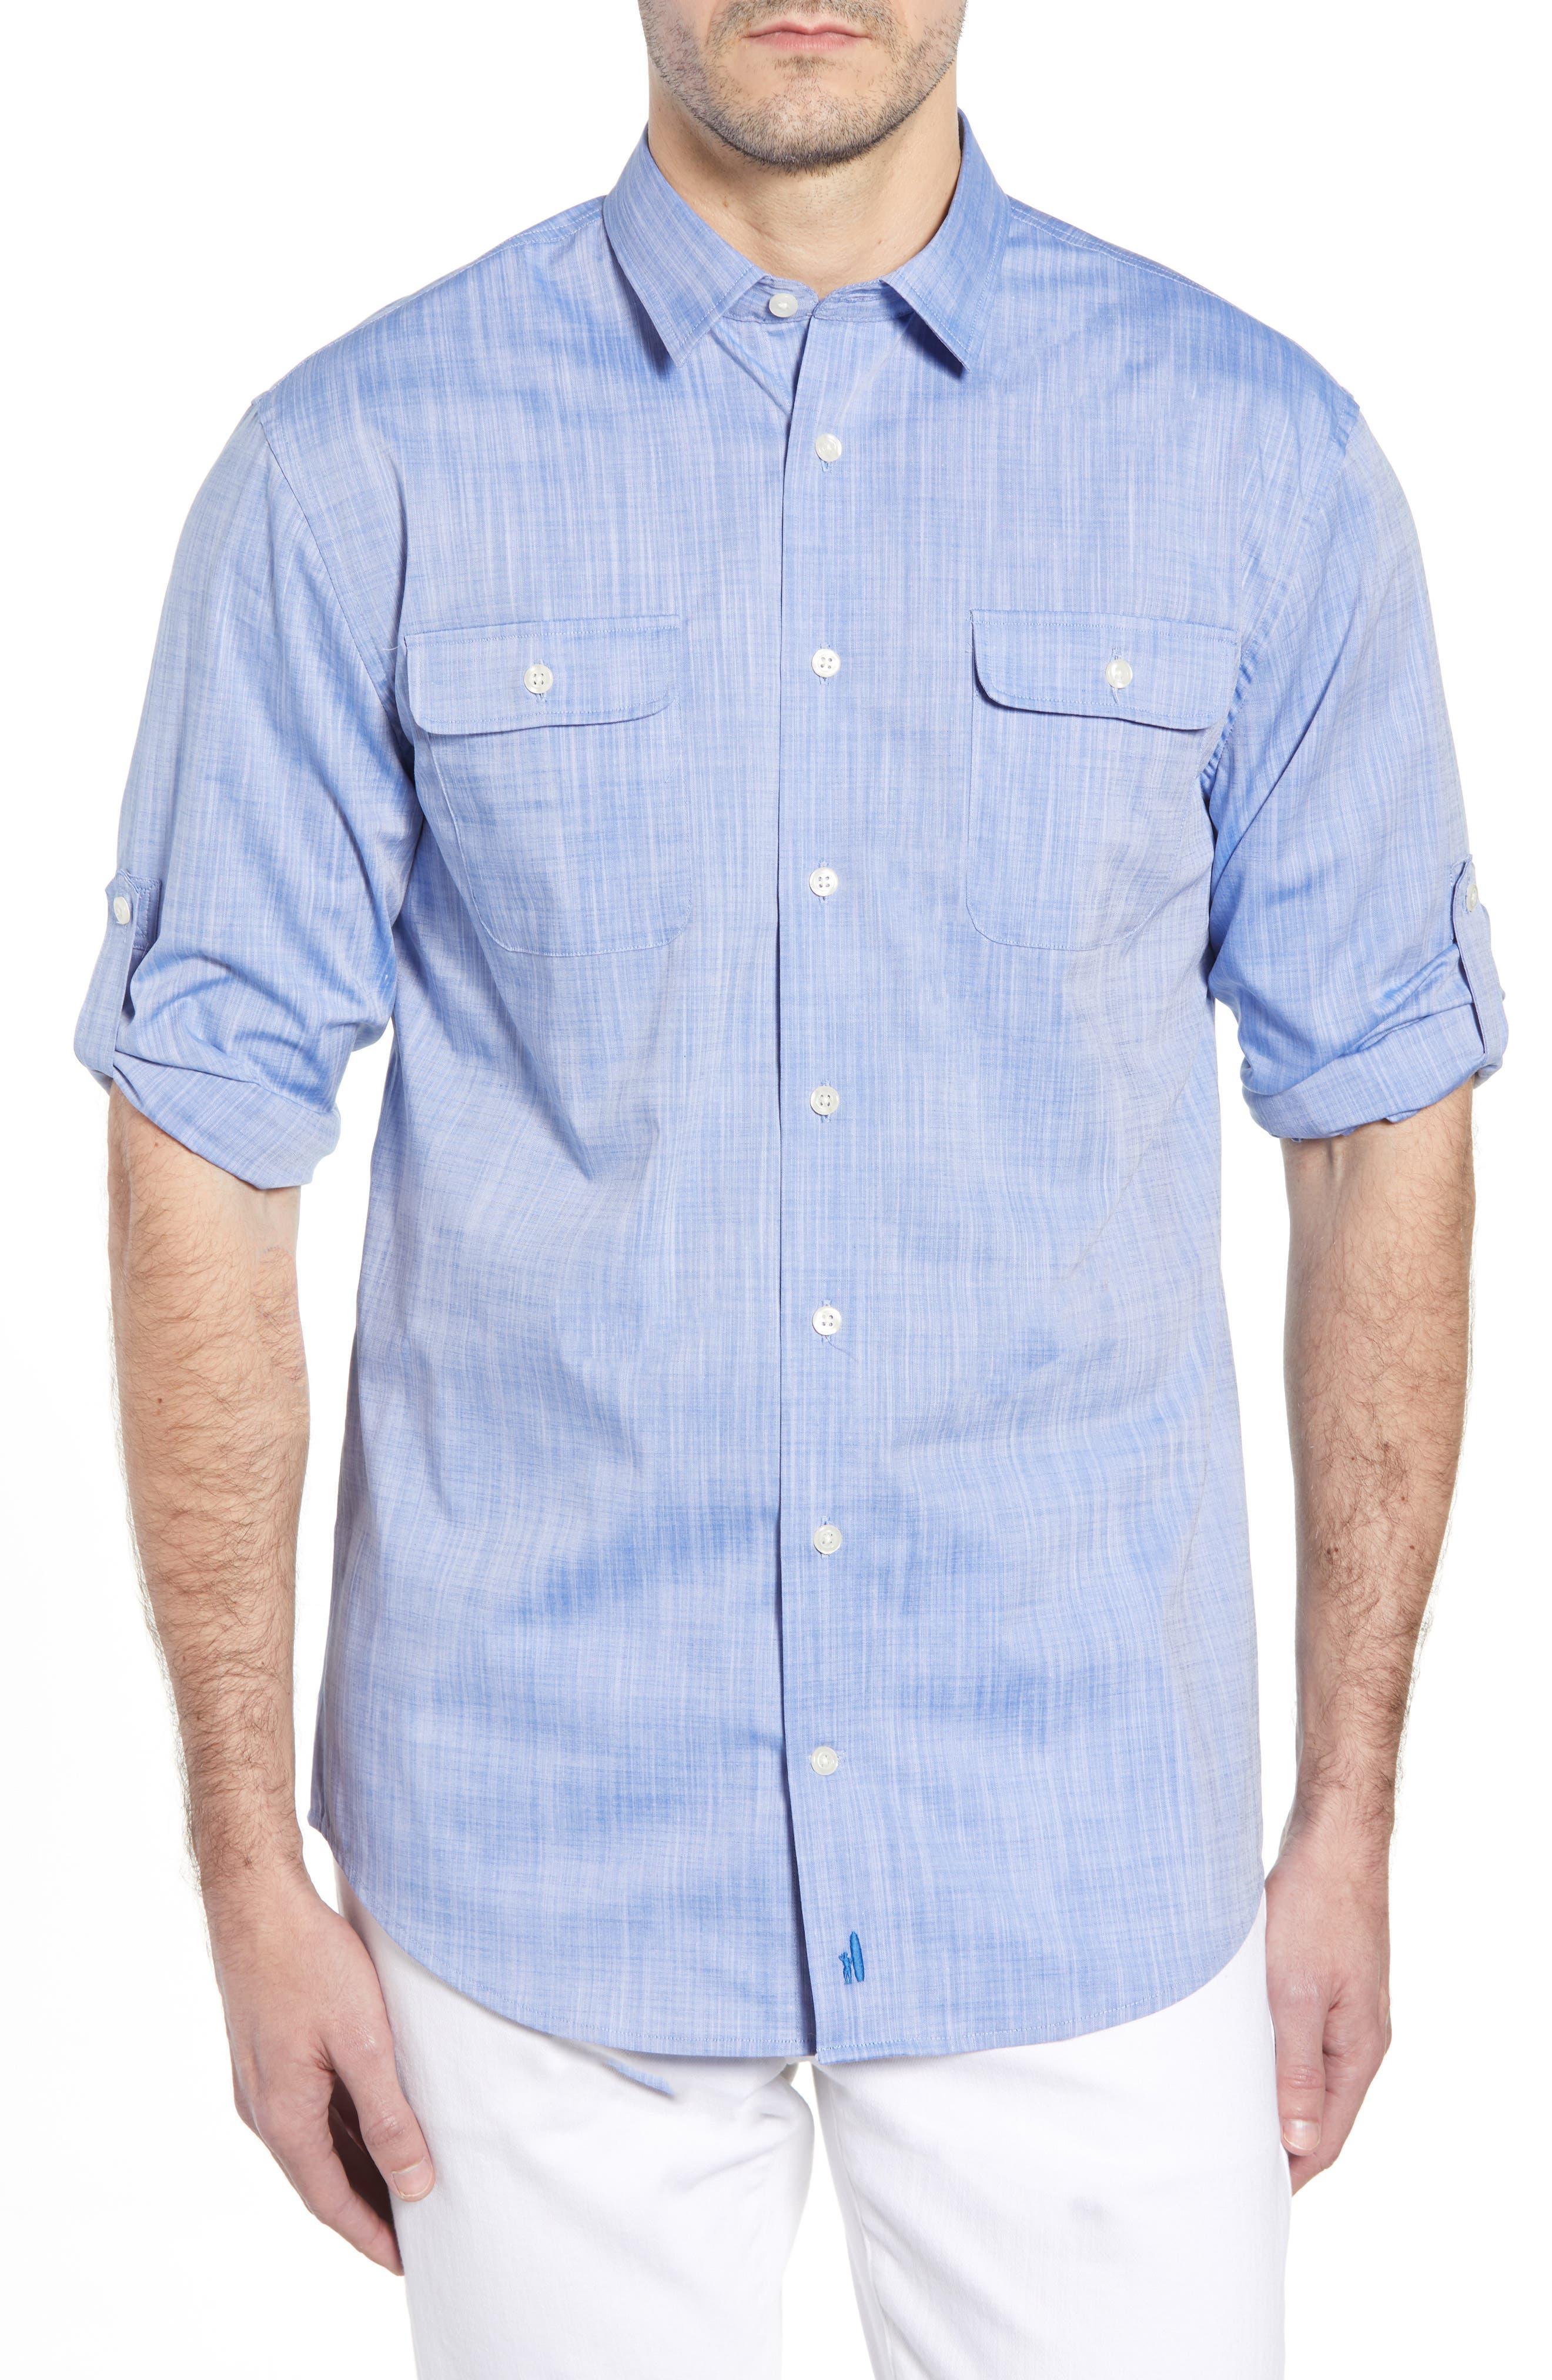 Hutton Classic Fit Shirt,                             Main thumbnail 1, color,                             Deep Water